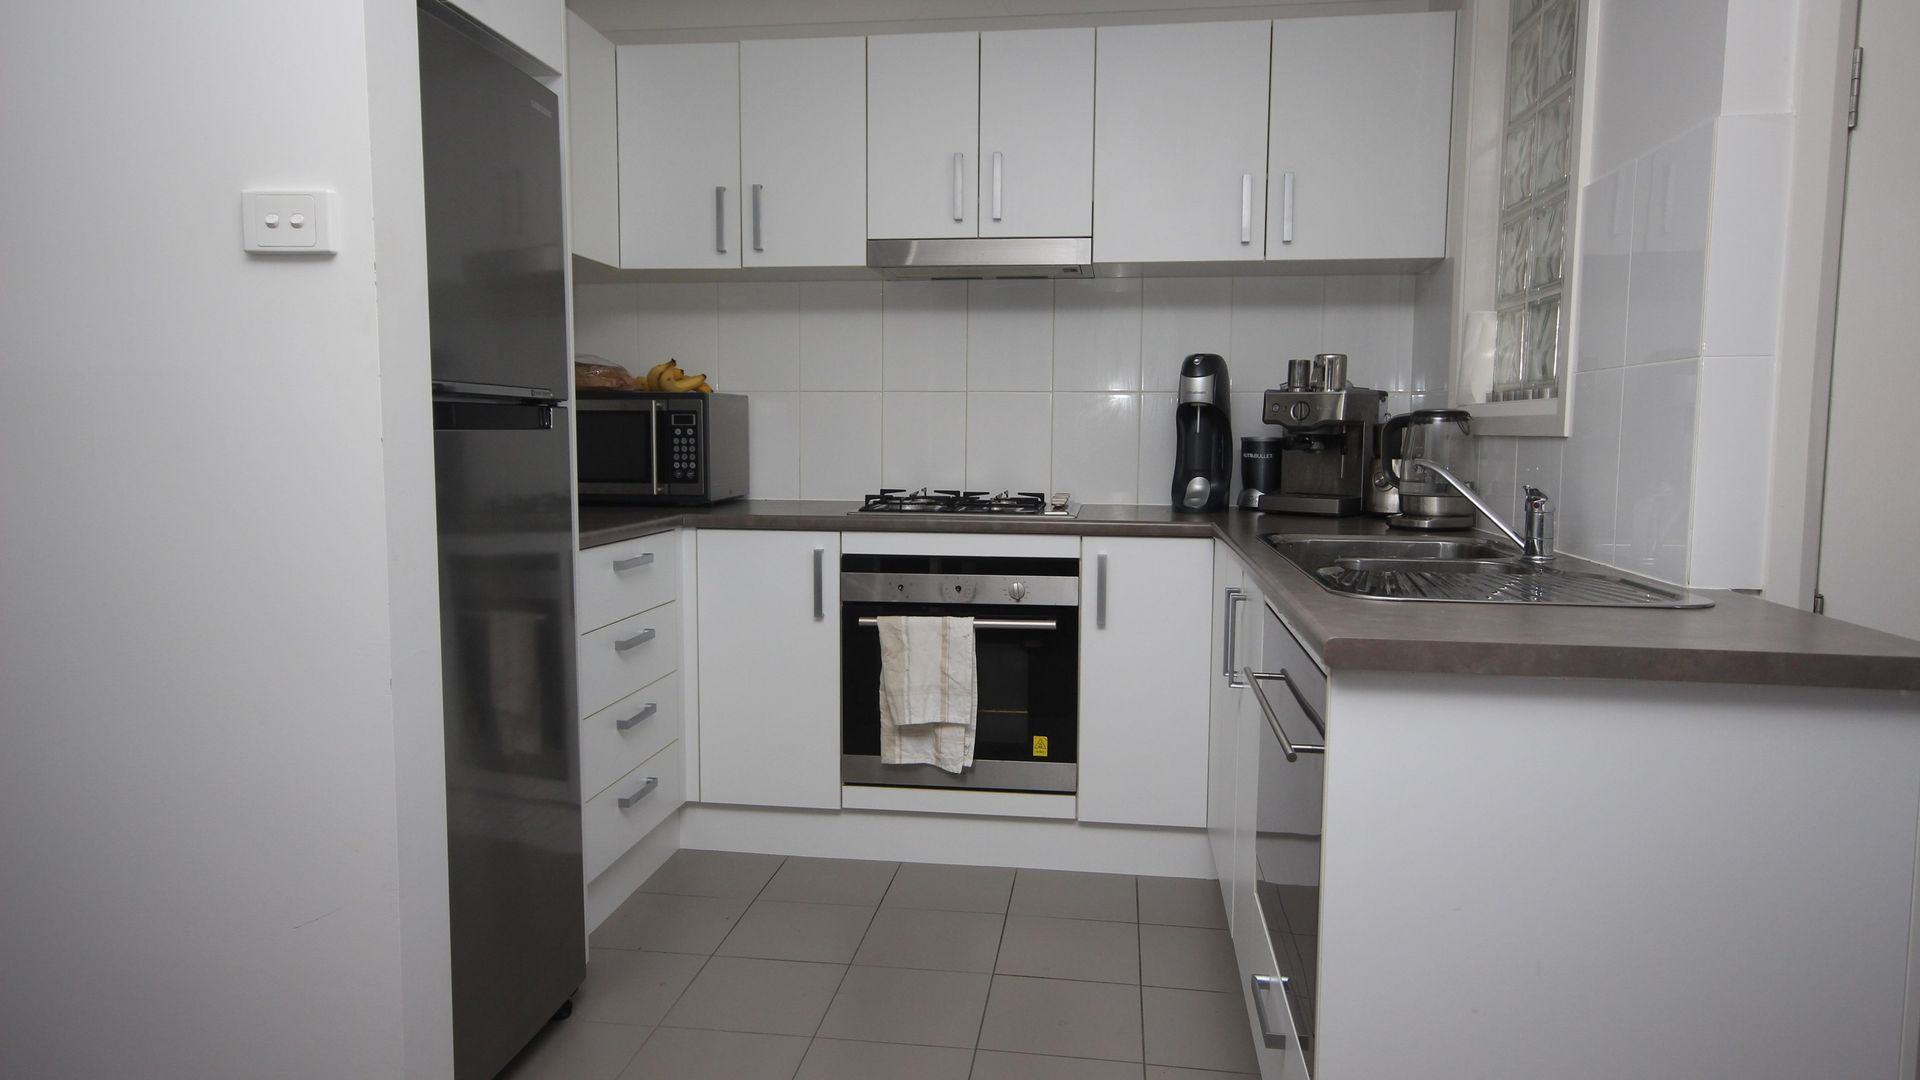 40/75 Abbott Street, Wallsend NSW 2287, Image 1